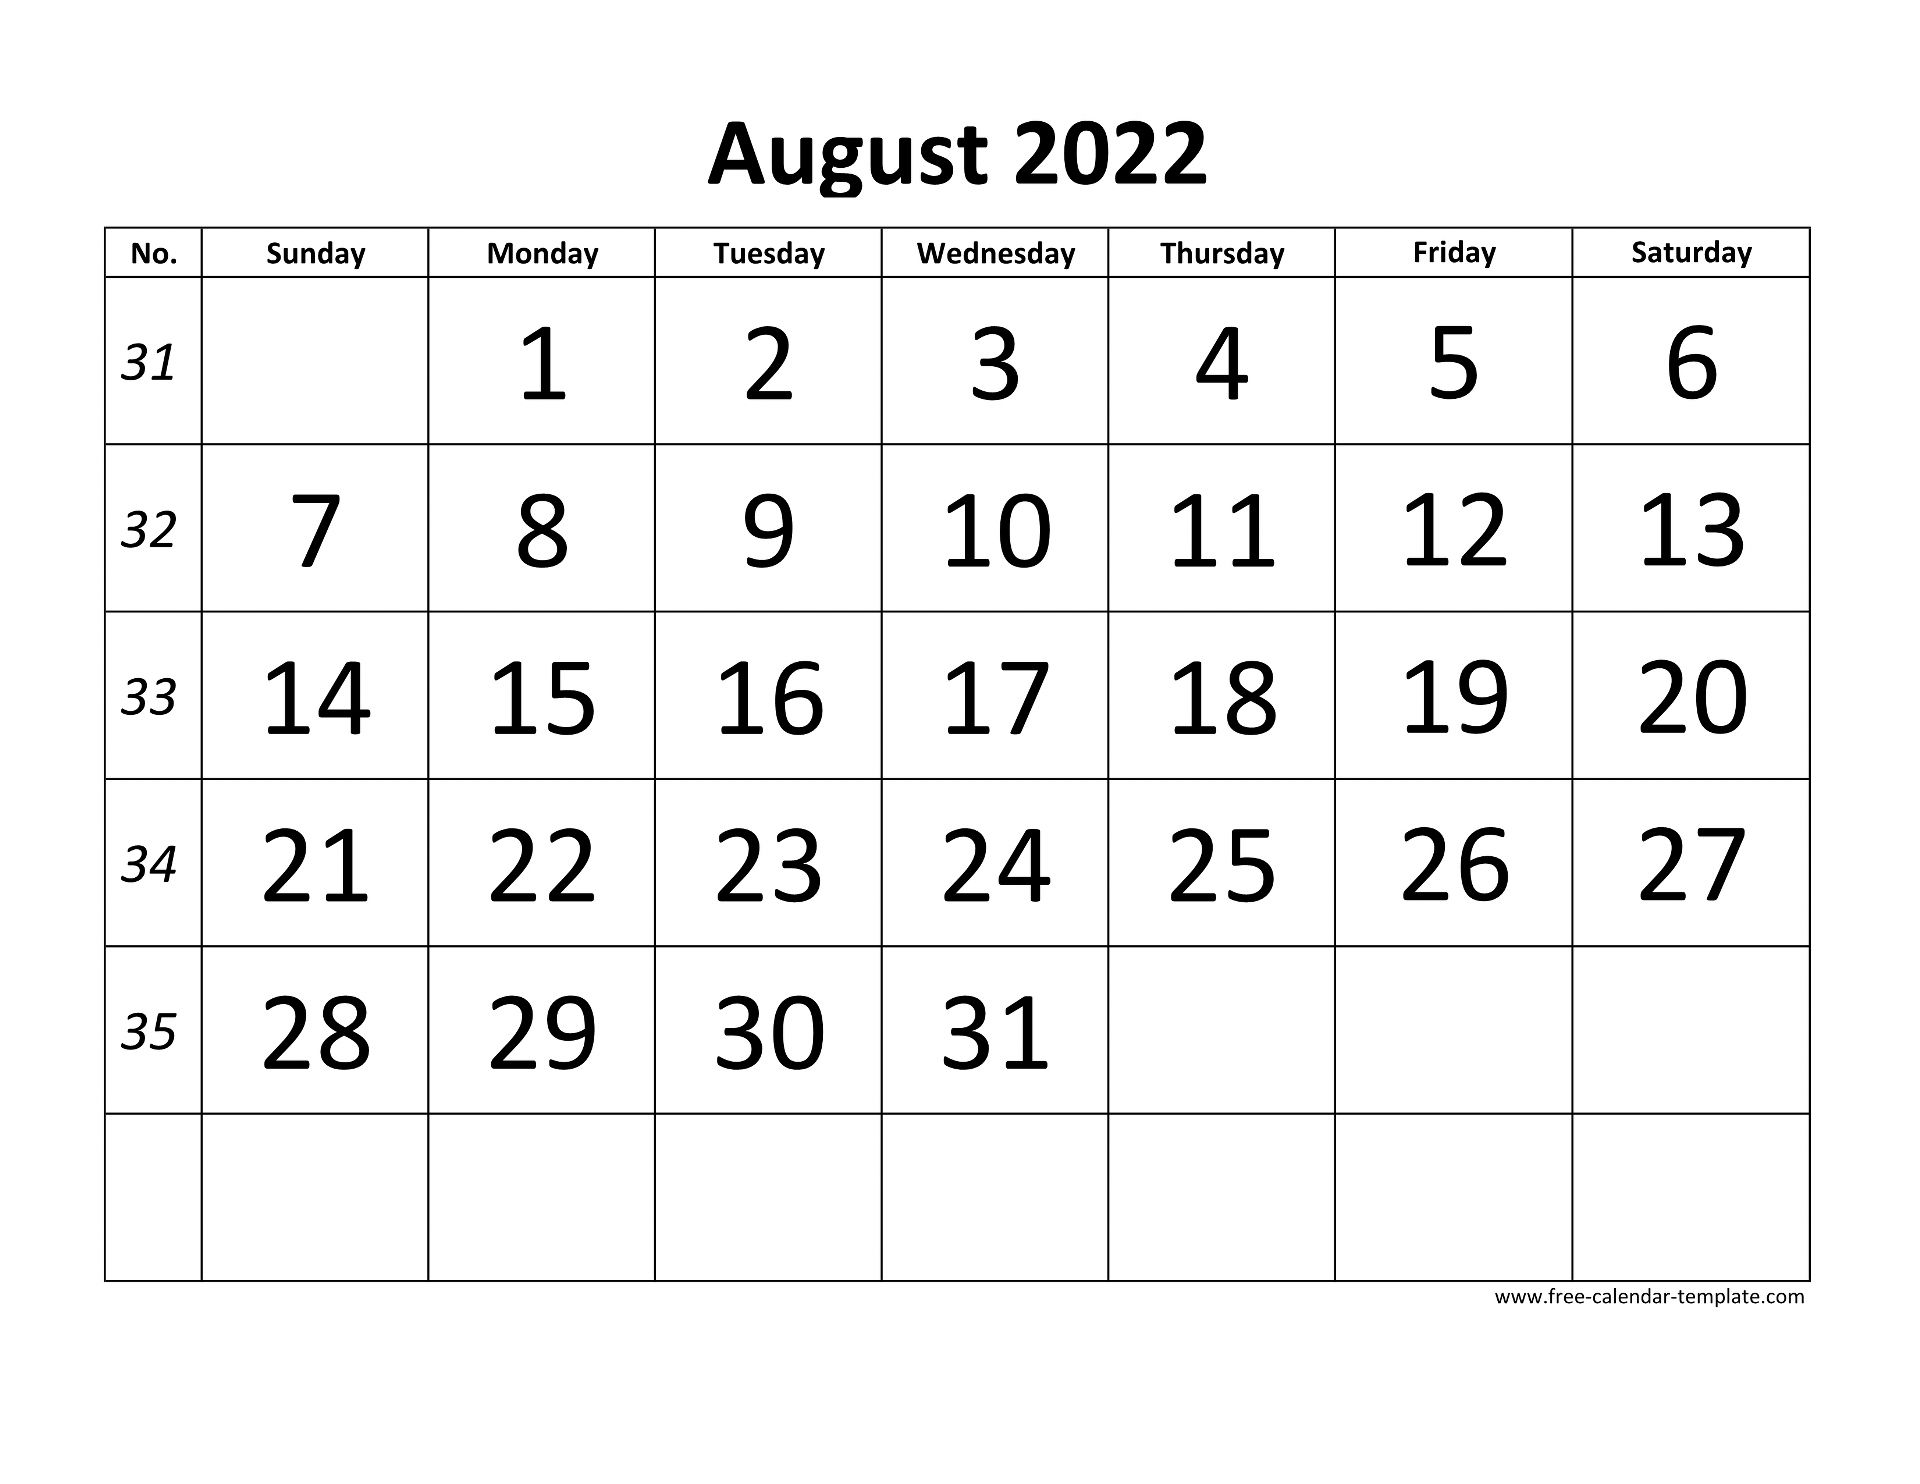 2022 August Calendar.August 2022 Calendar Designed With Large Font Horizontal Free Calendar Template Com